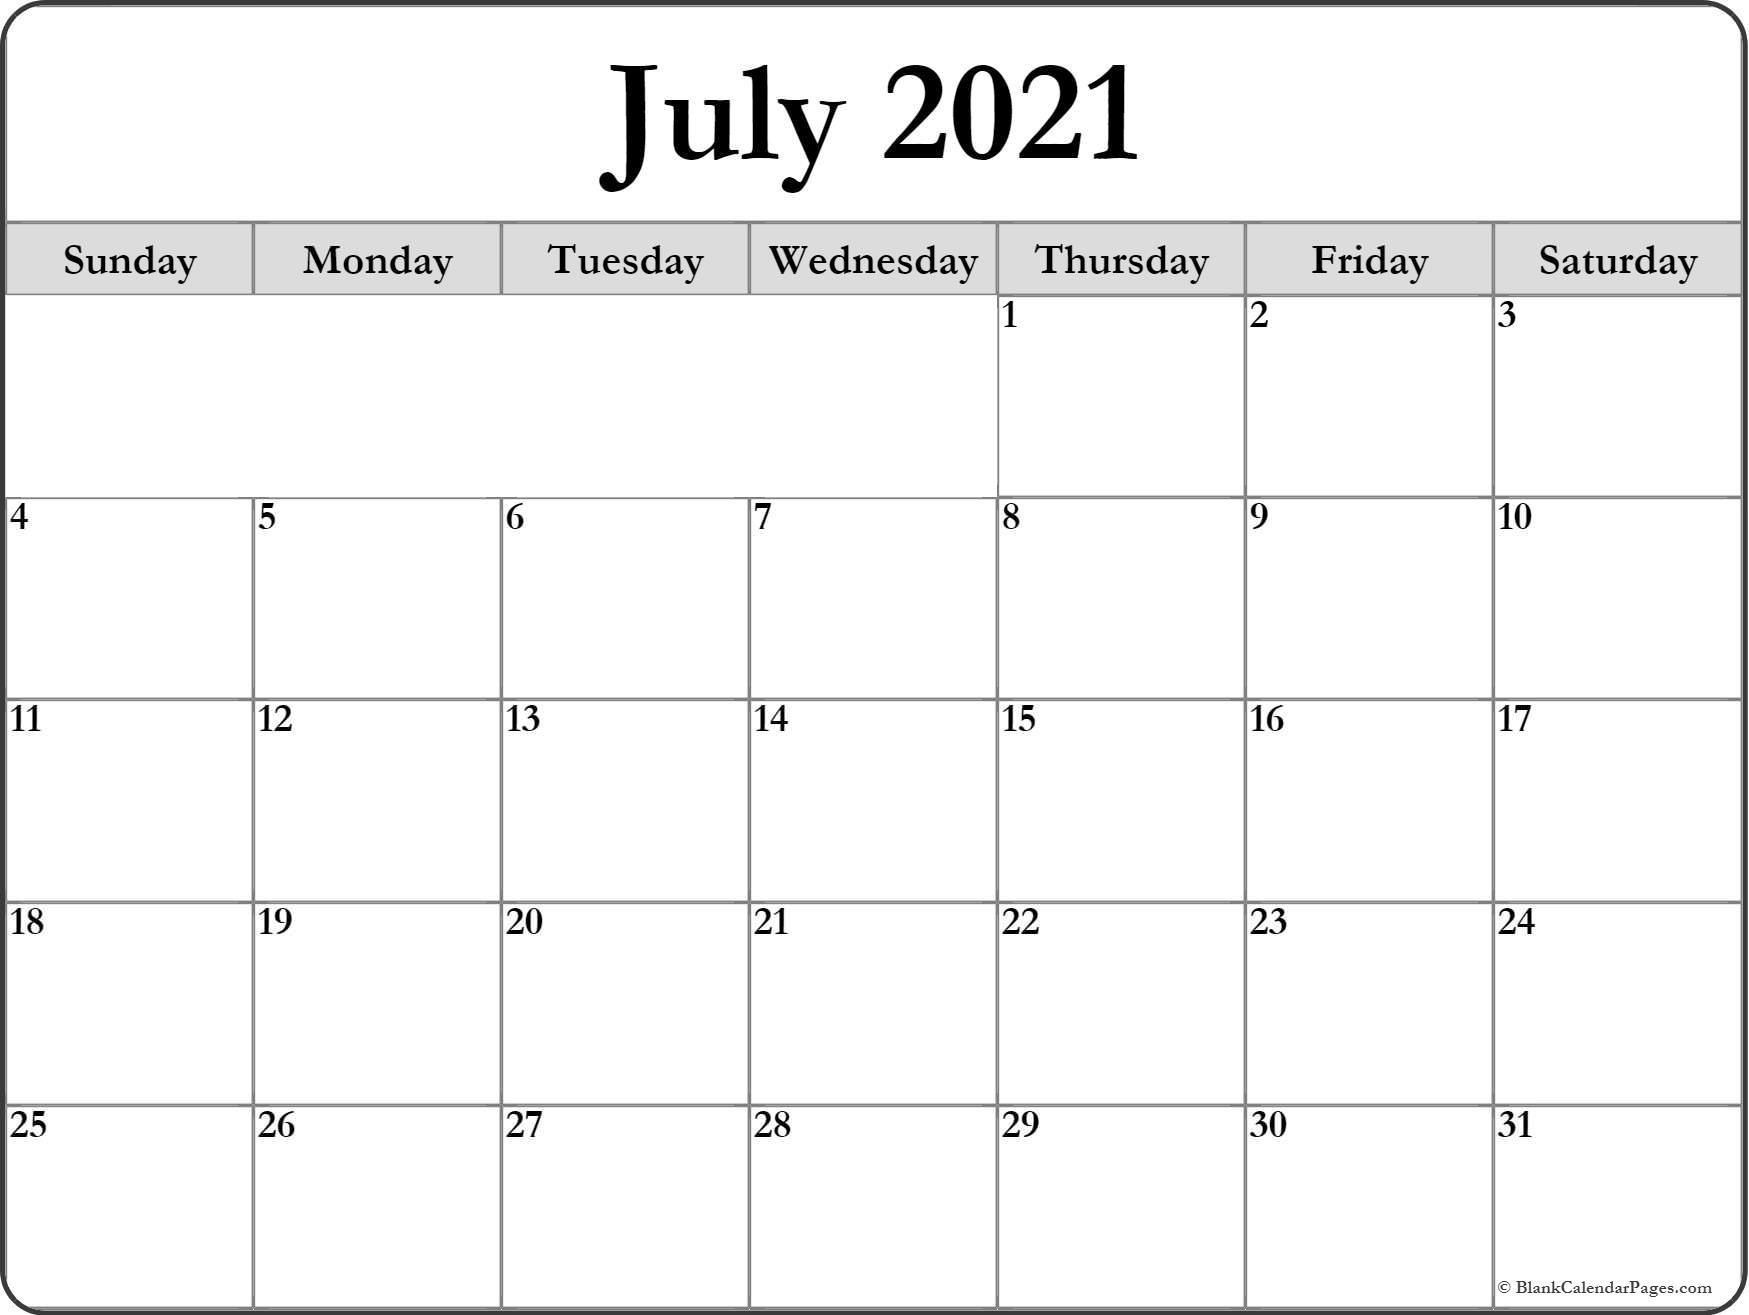 Weekly Calendar Template 2021 Blank for Agenda